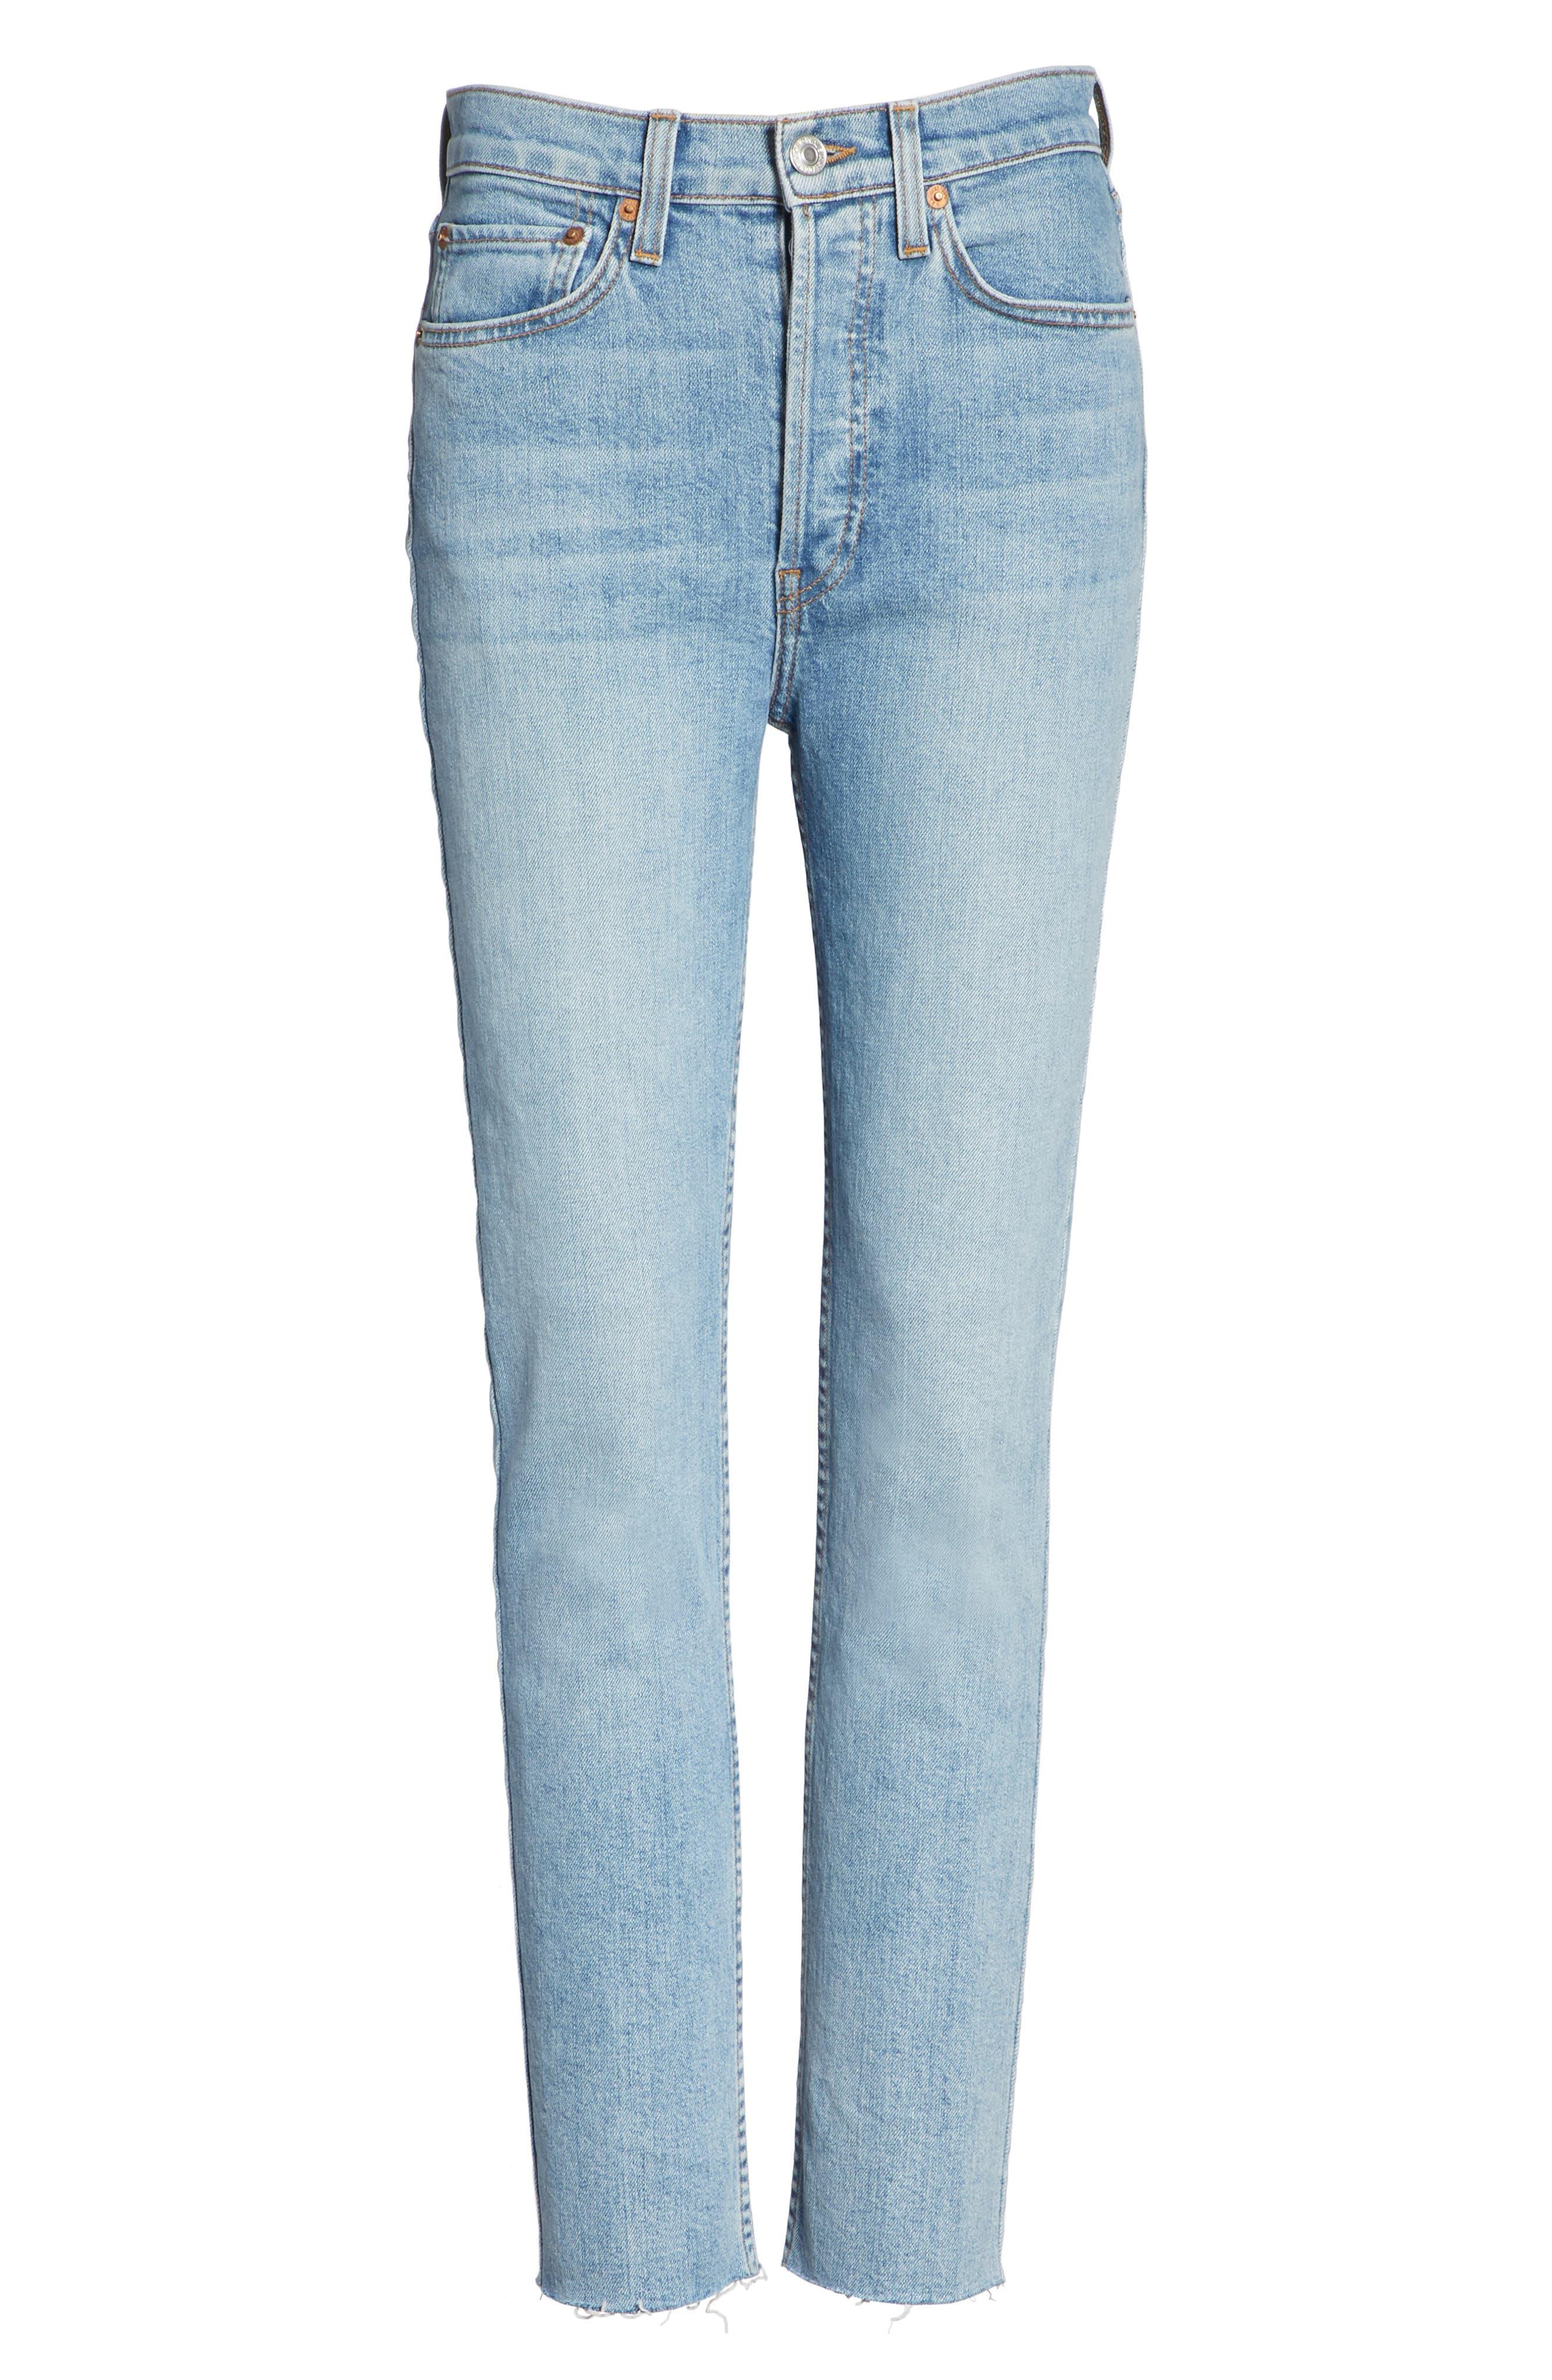 High Waist Crop Jeans,                             Alternate thumbnail 6, color,                             Dark Wash